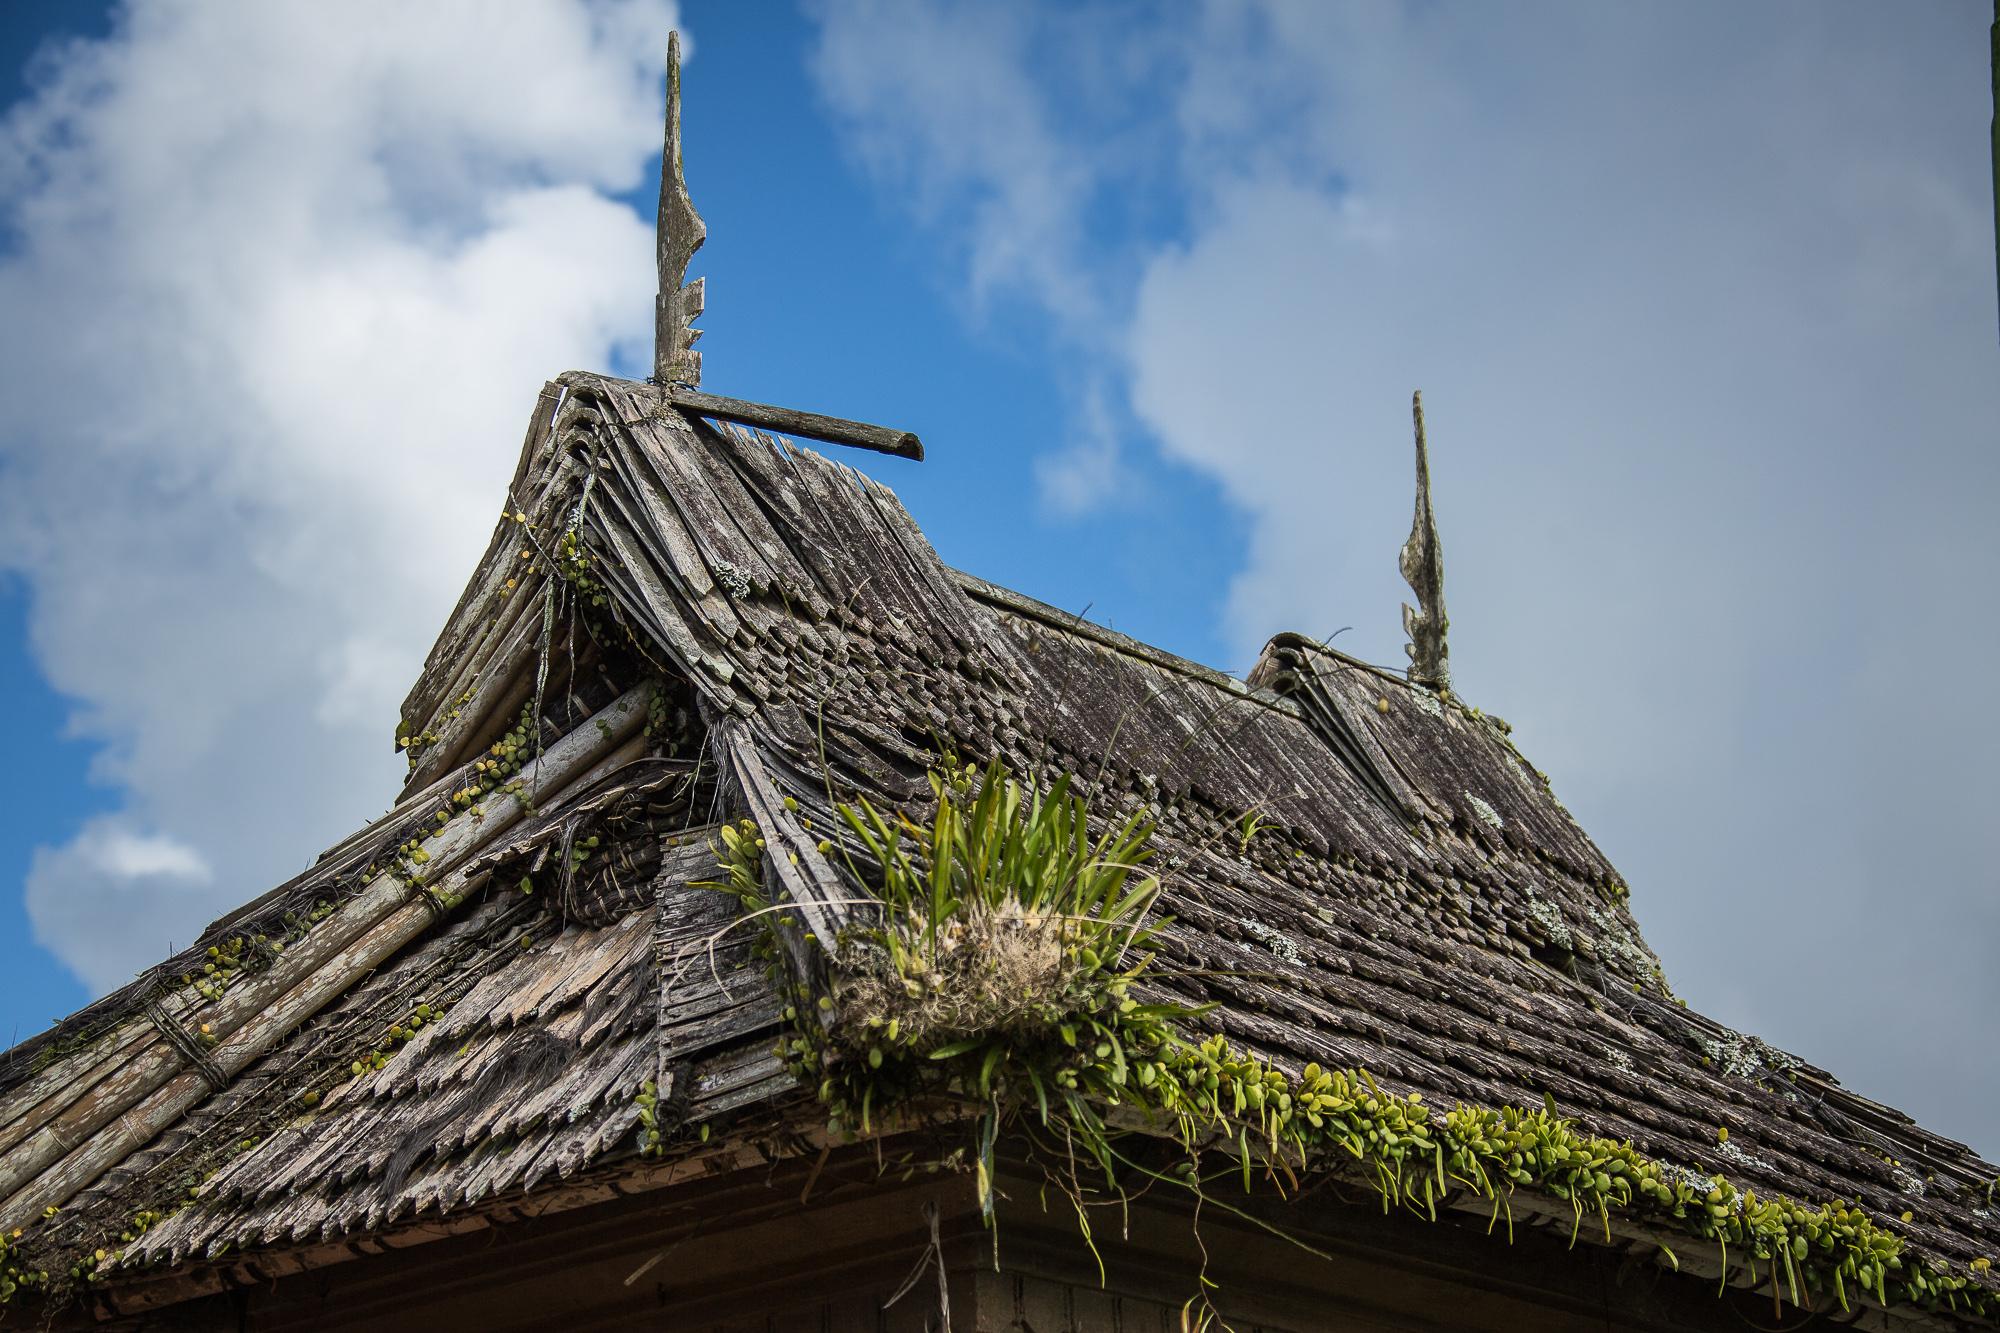 Tomaz Velechovsky_Ziva streha